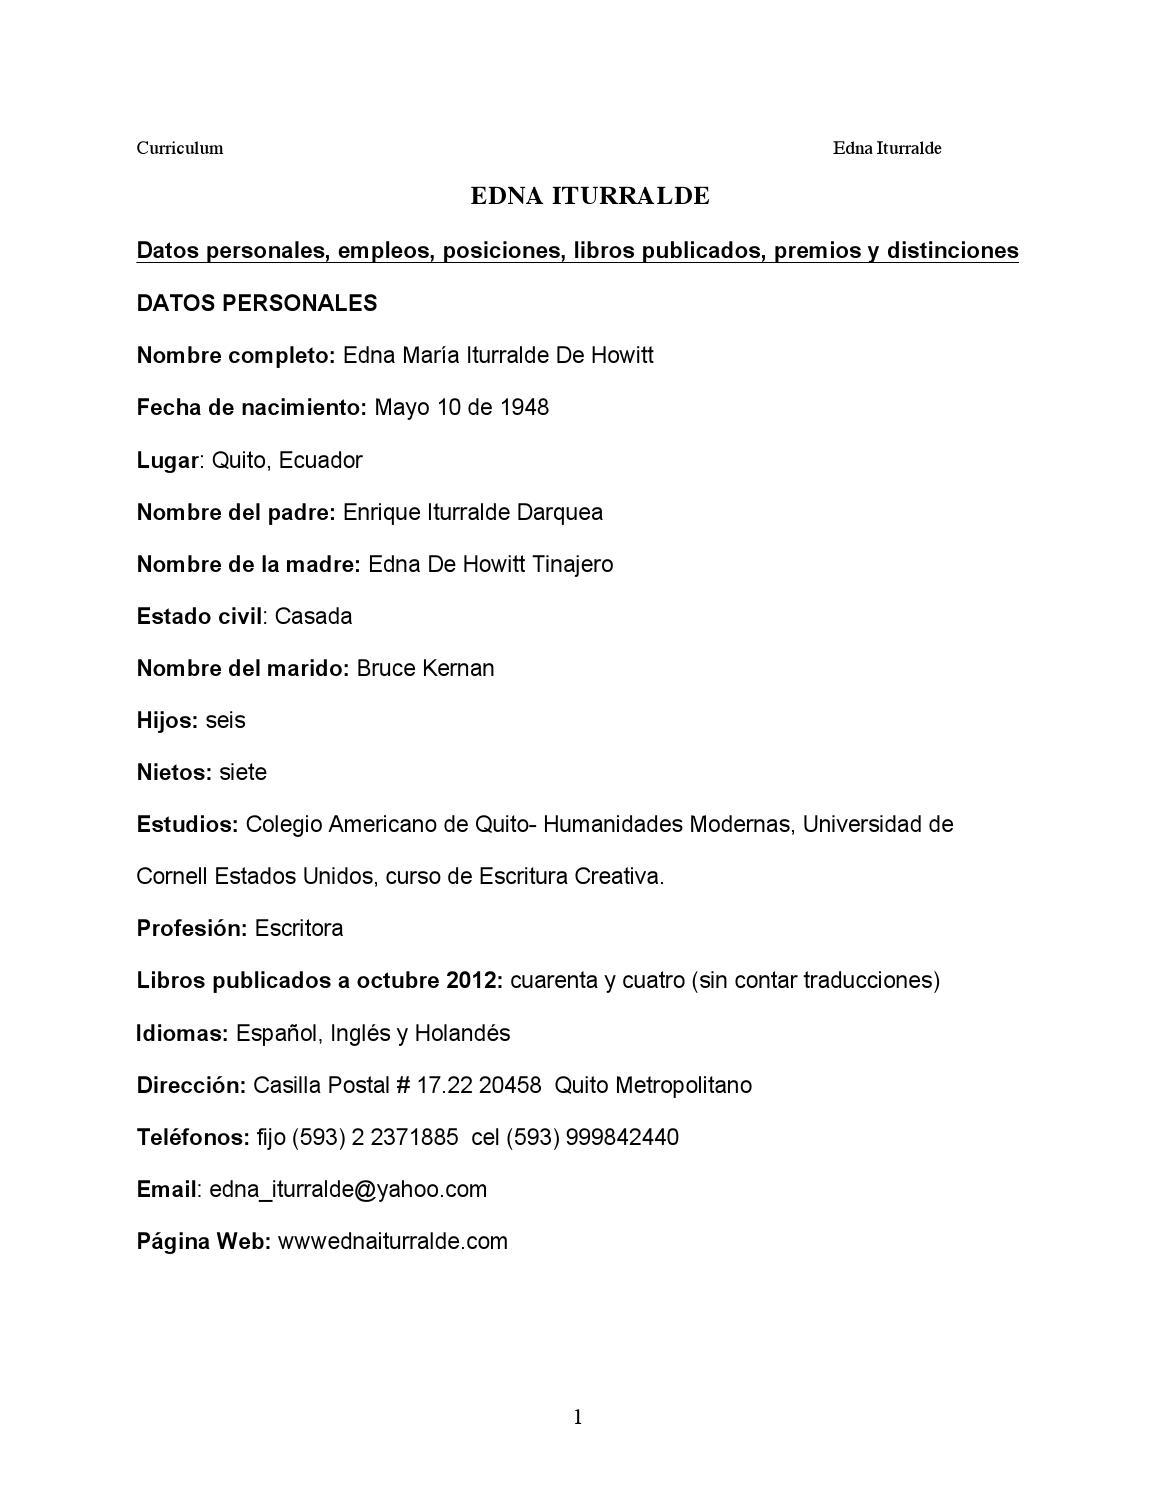 Curriculum vitae edna iturralde mayo 2013 by Carolina - issuu